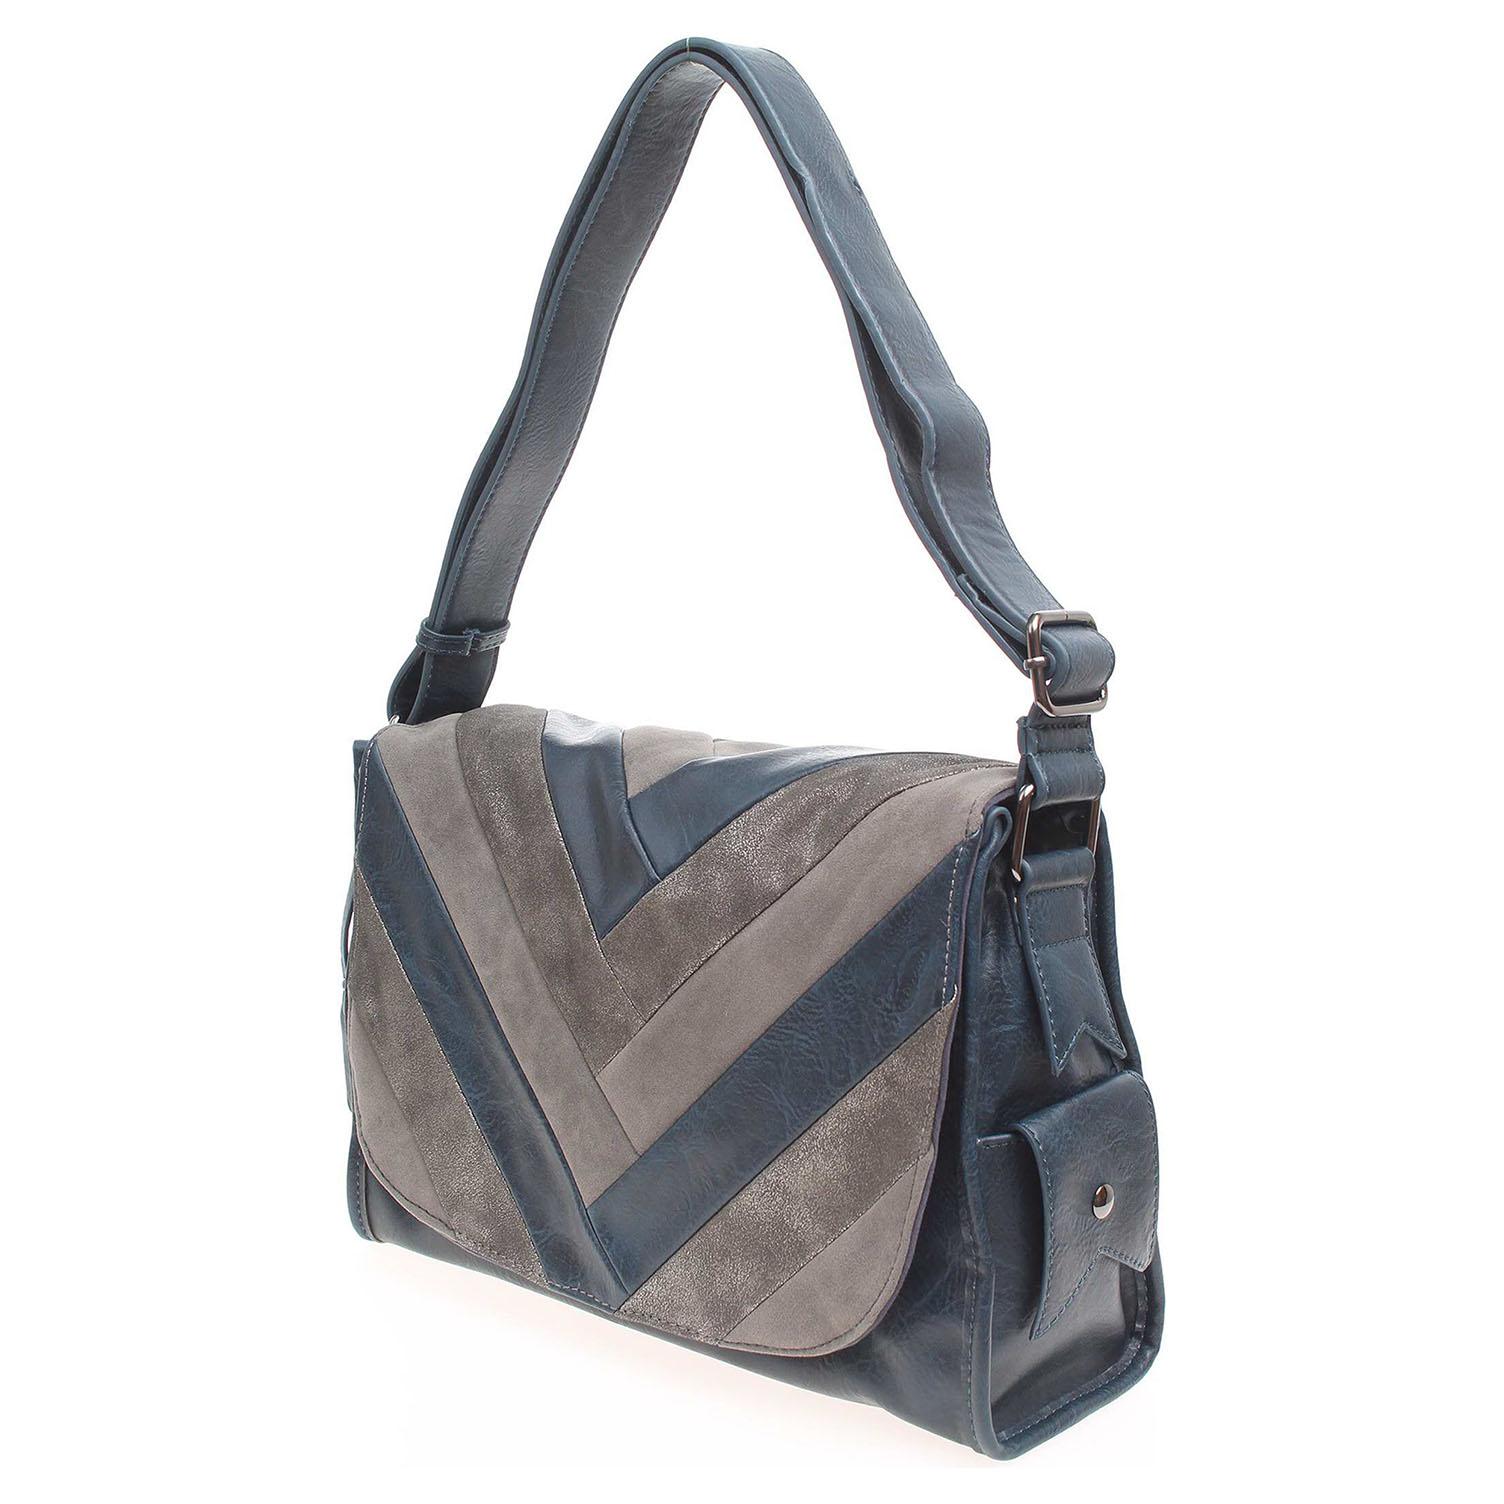 Ecco Remonte dámská kabelka Q0414-14 modrá 11891243